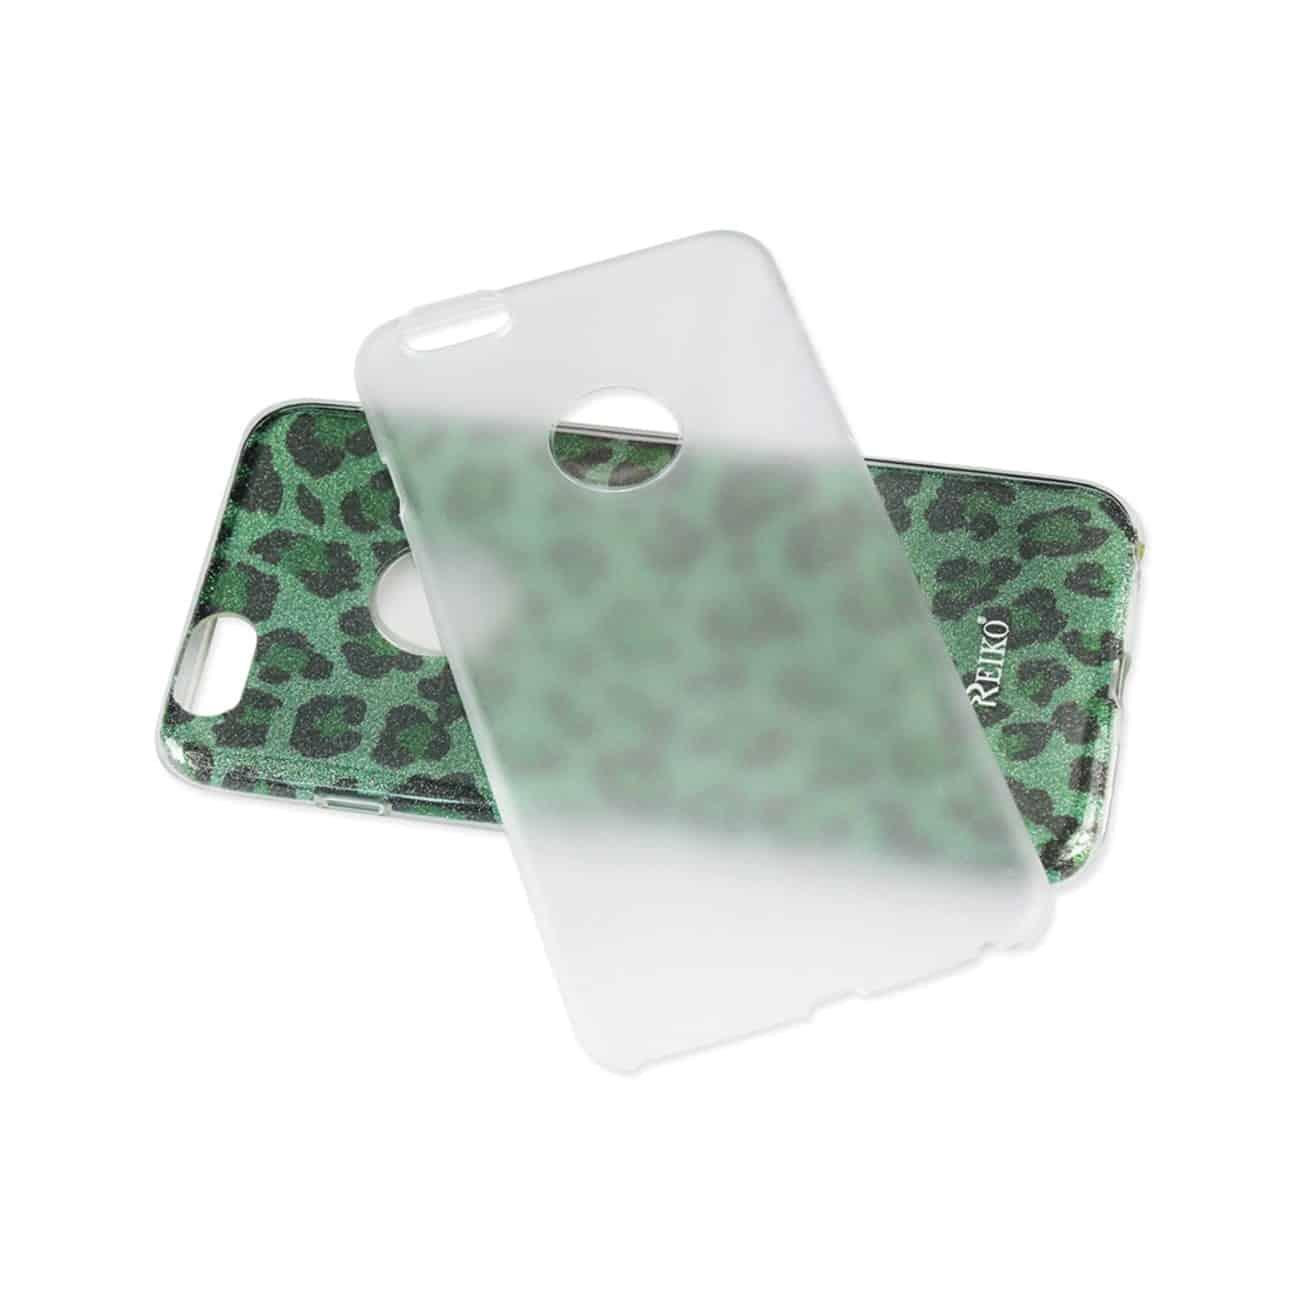 IPHONE 6/ 6S SHINE GLITTER SHIMMER LEOPARD HYBRID CASE IN LEOPARD GREEN